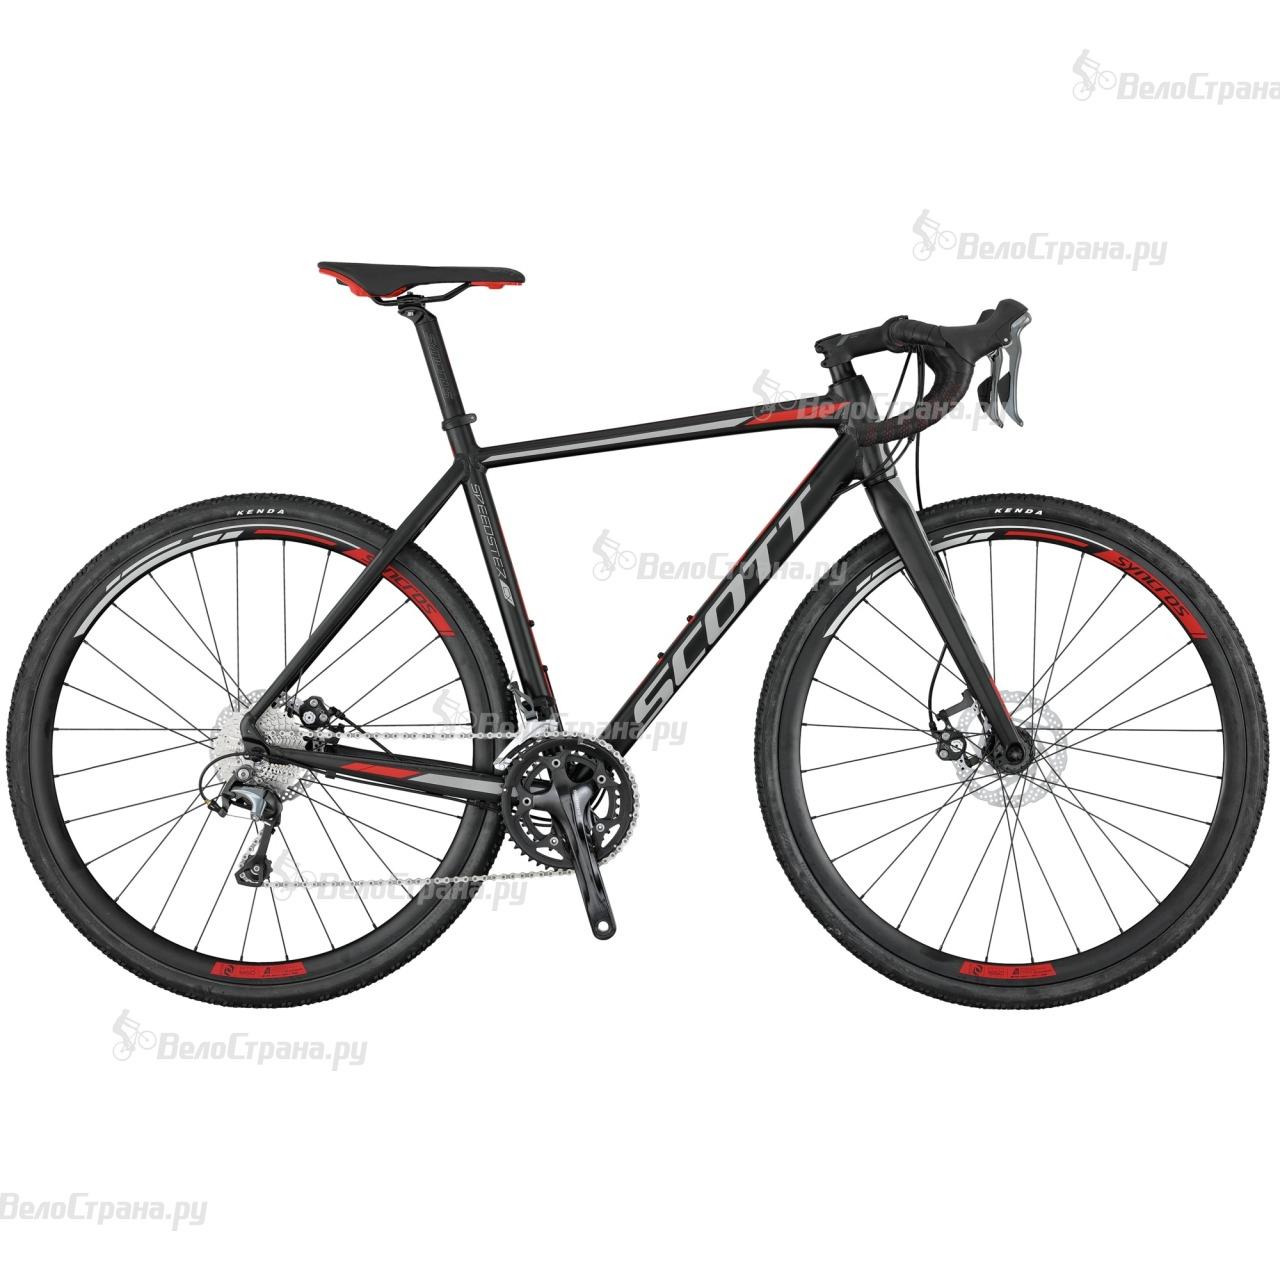 Велосипед Scott Speedster CX 20 Disc (2017) велосипед scott speedster cx 20 disc 28 2016